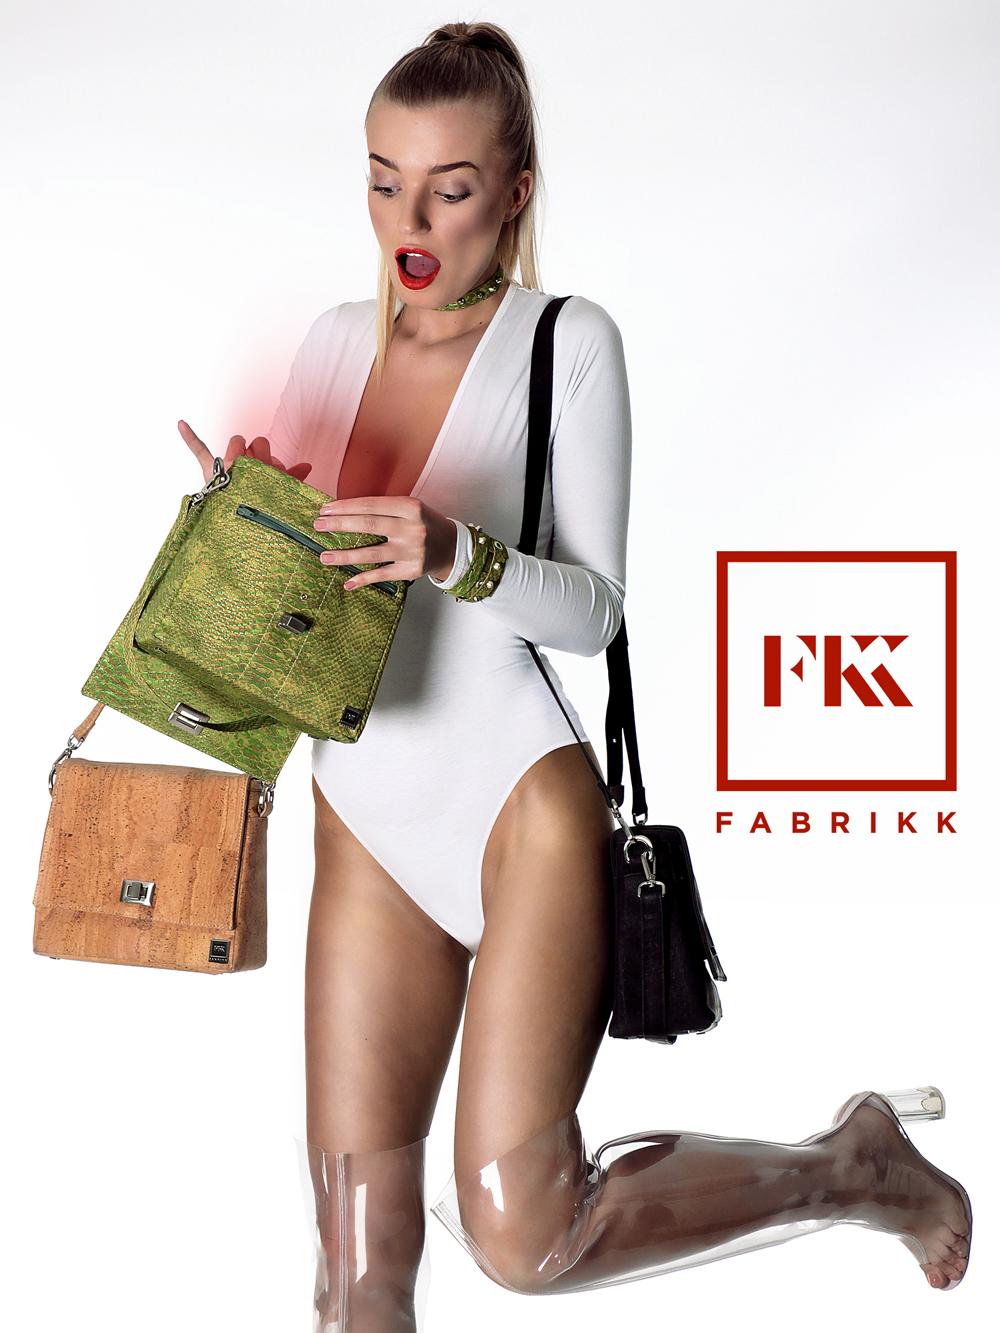 Fabrikk campaign SS17 ft Tom Zanetti and Anna Tyburska shot by Studio Voir 8